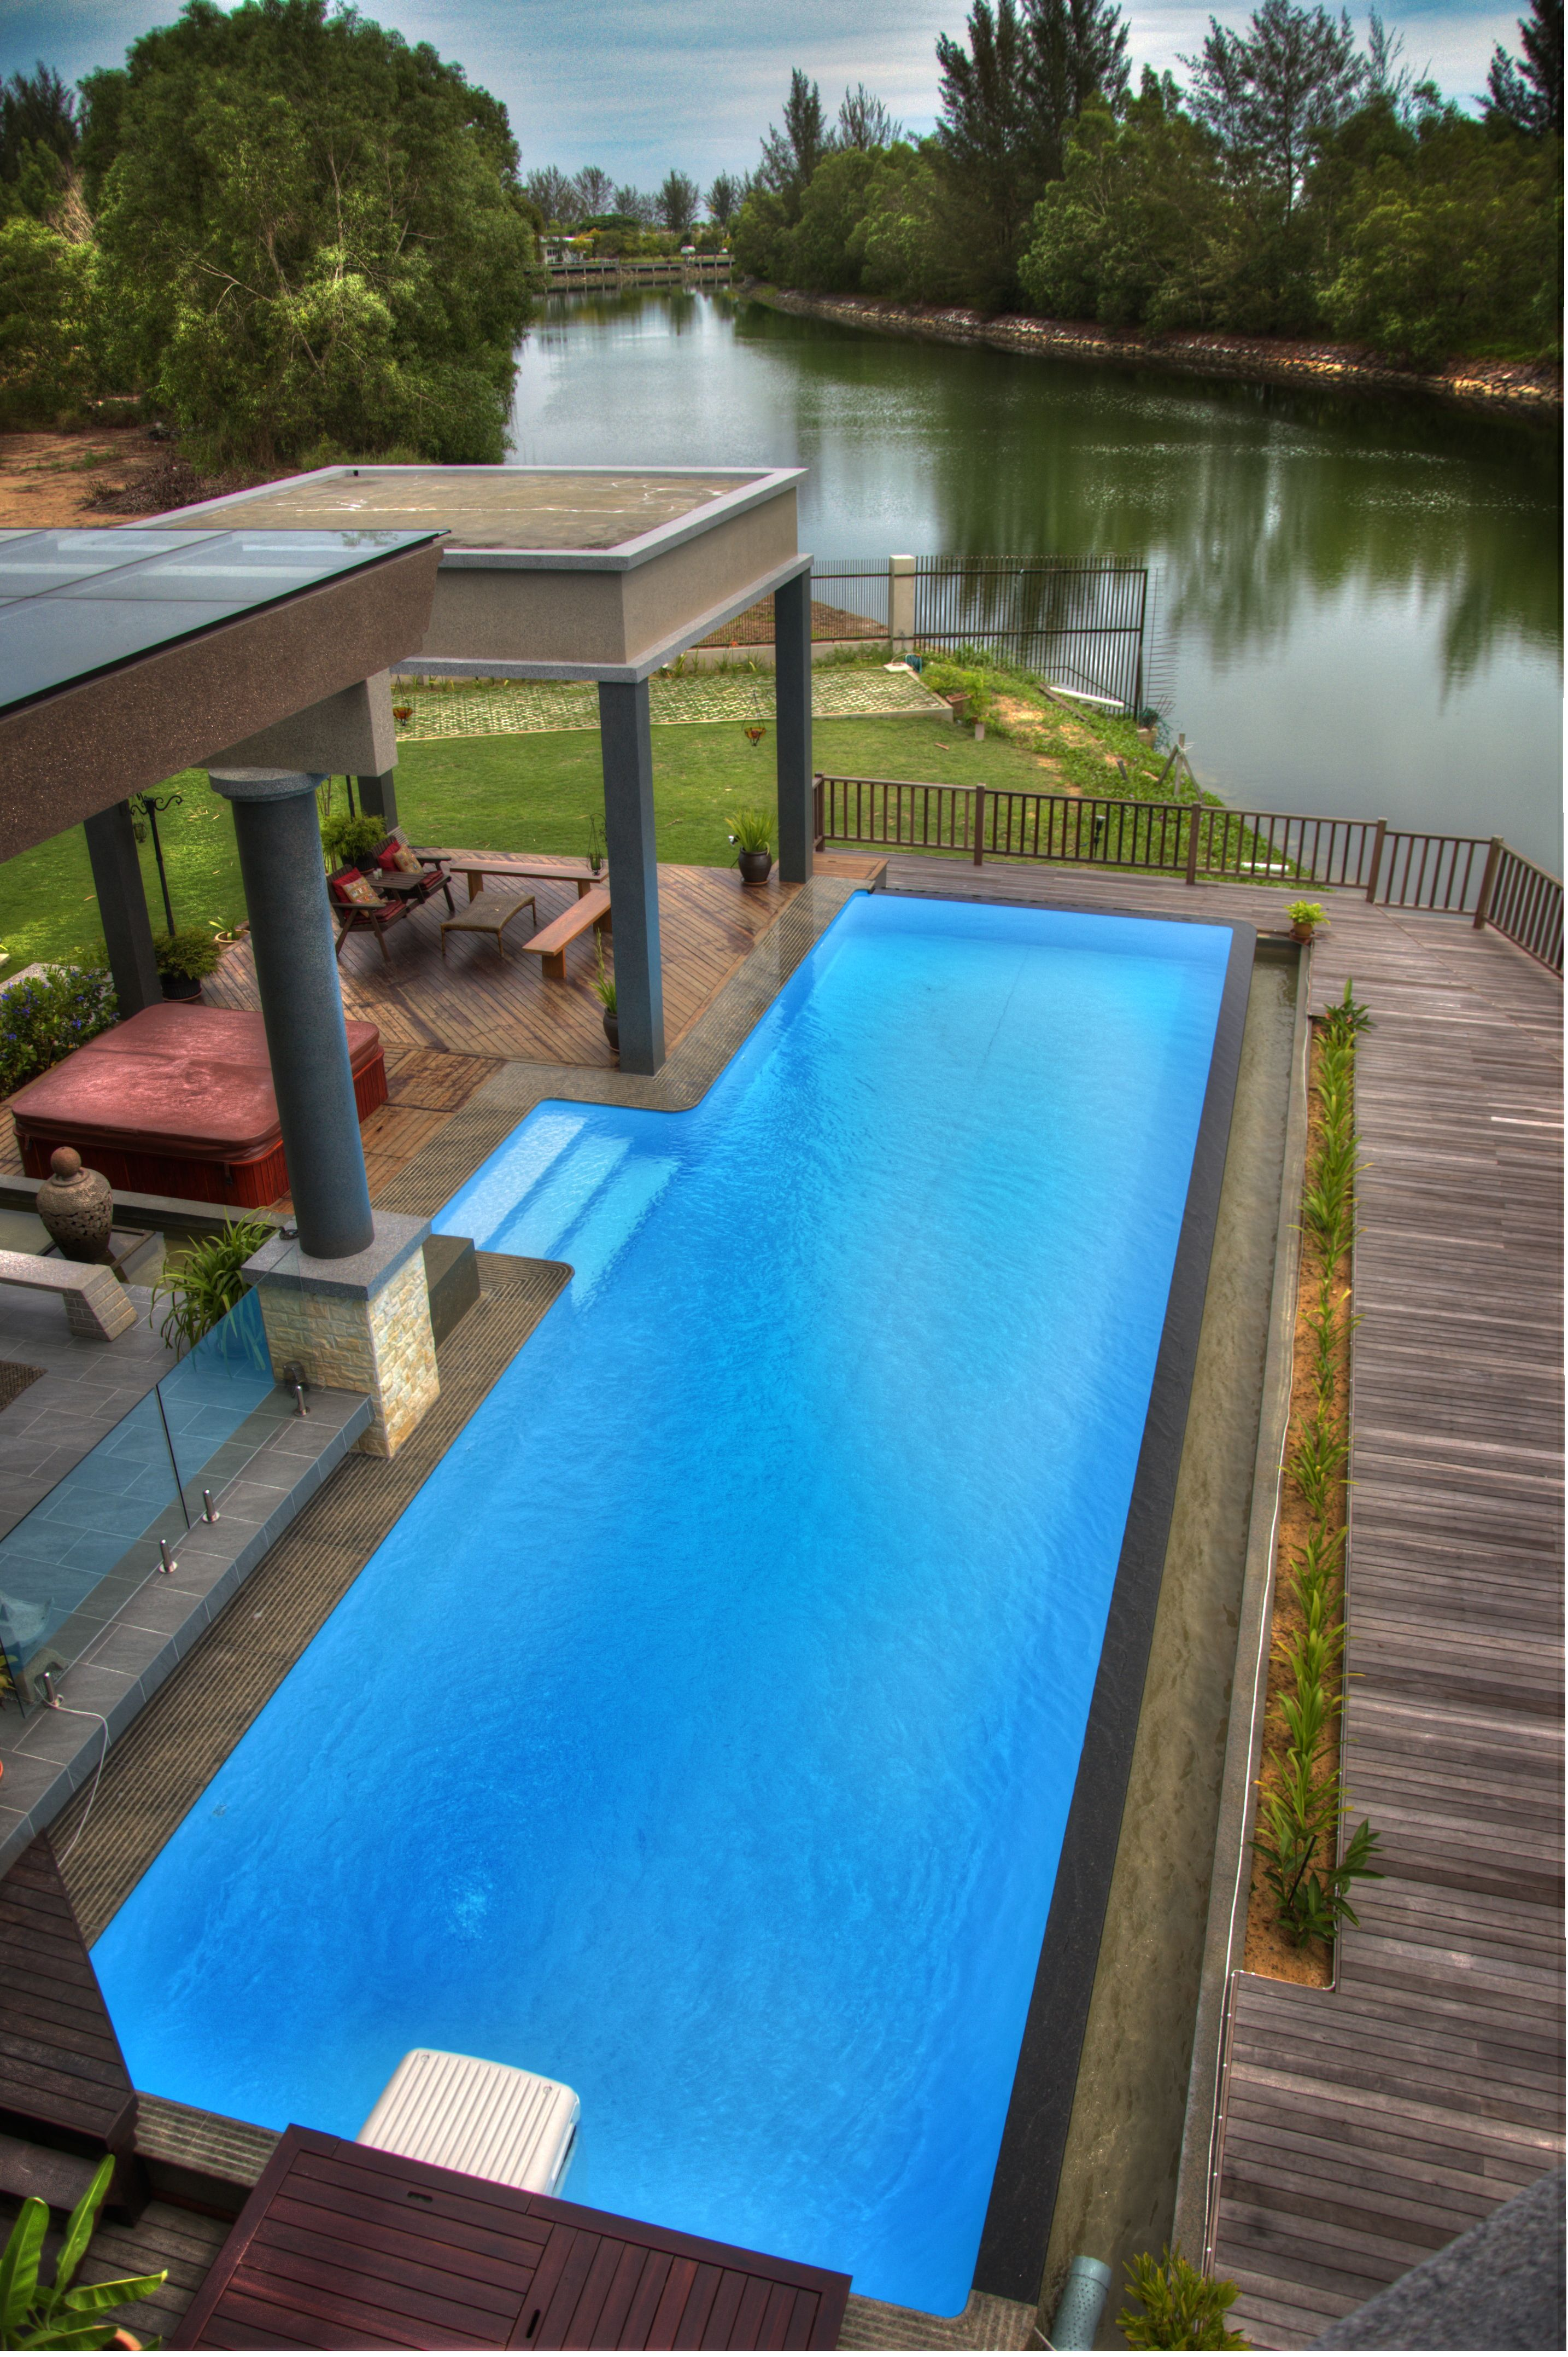 Infinity feature pool (15m x 4m x 1.2m) | Desjoyaux Pool | Outdoor ...